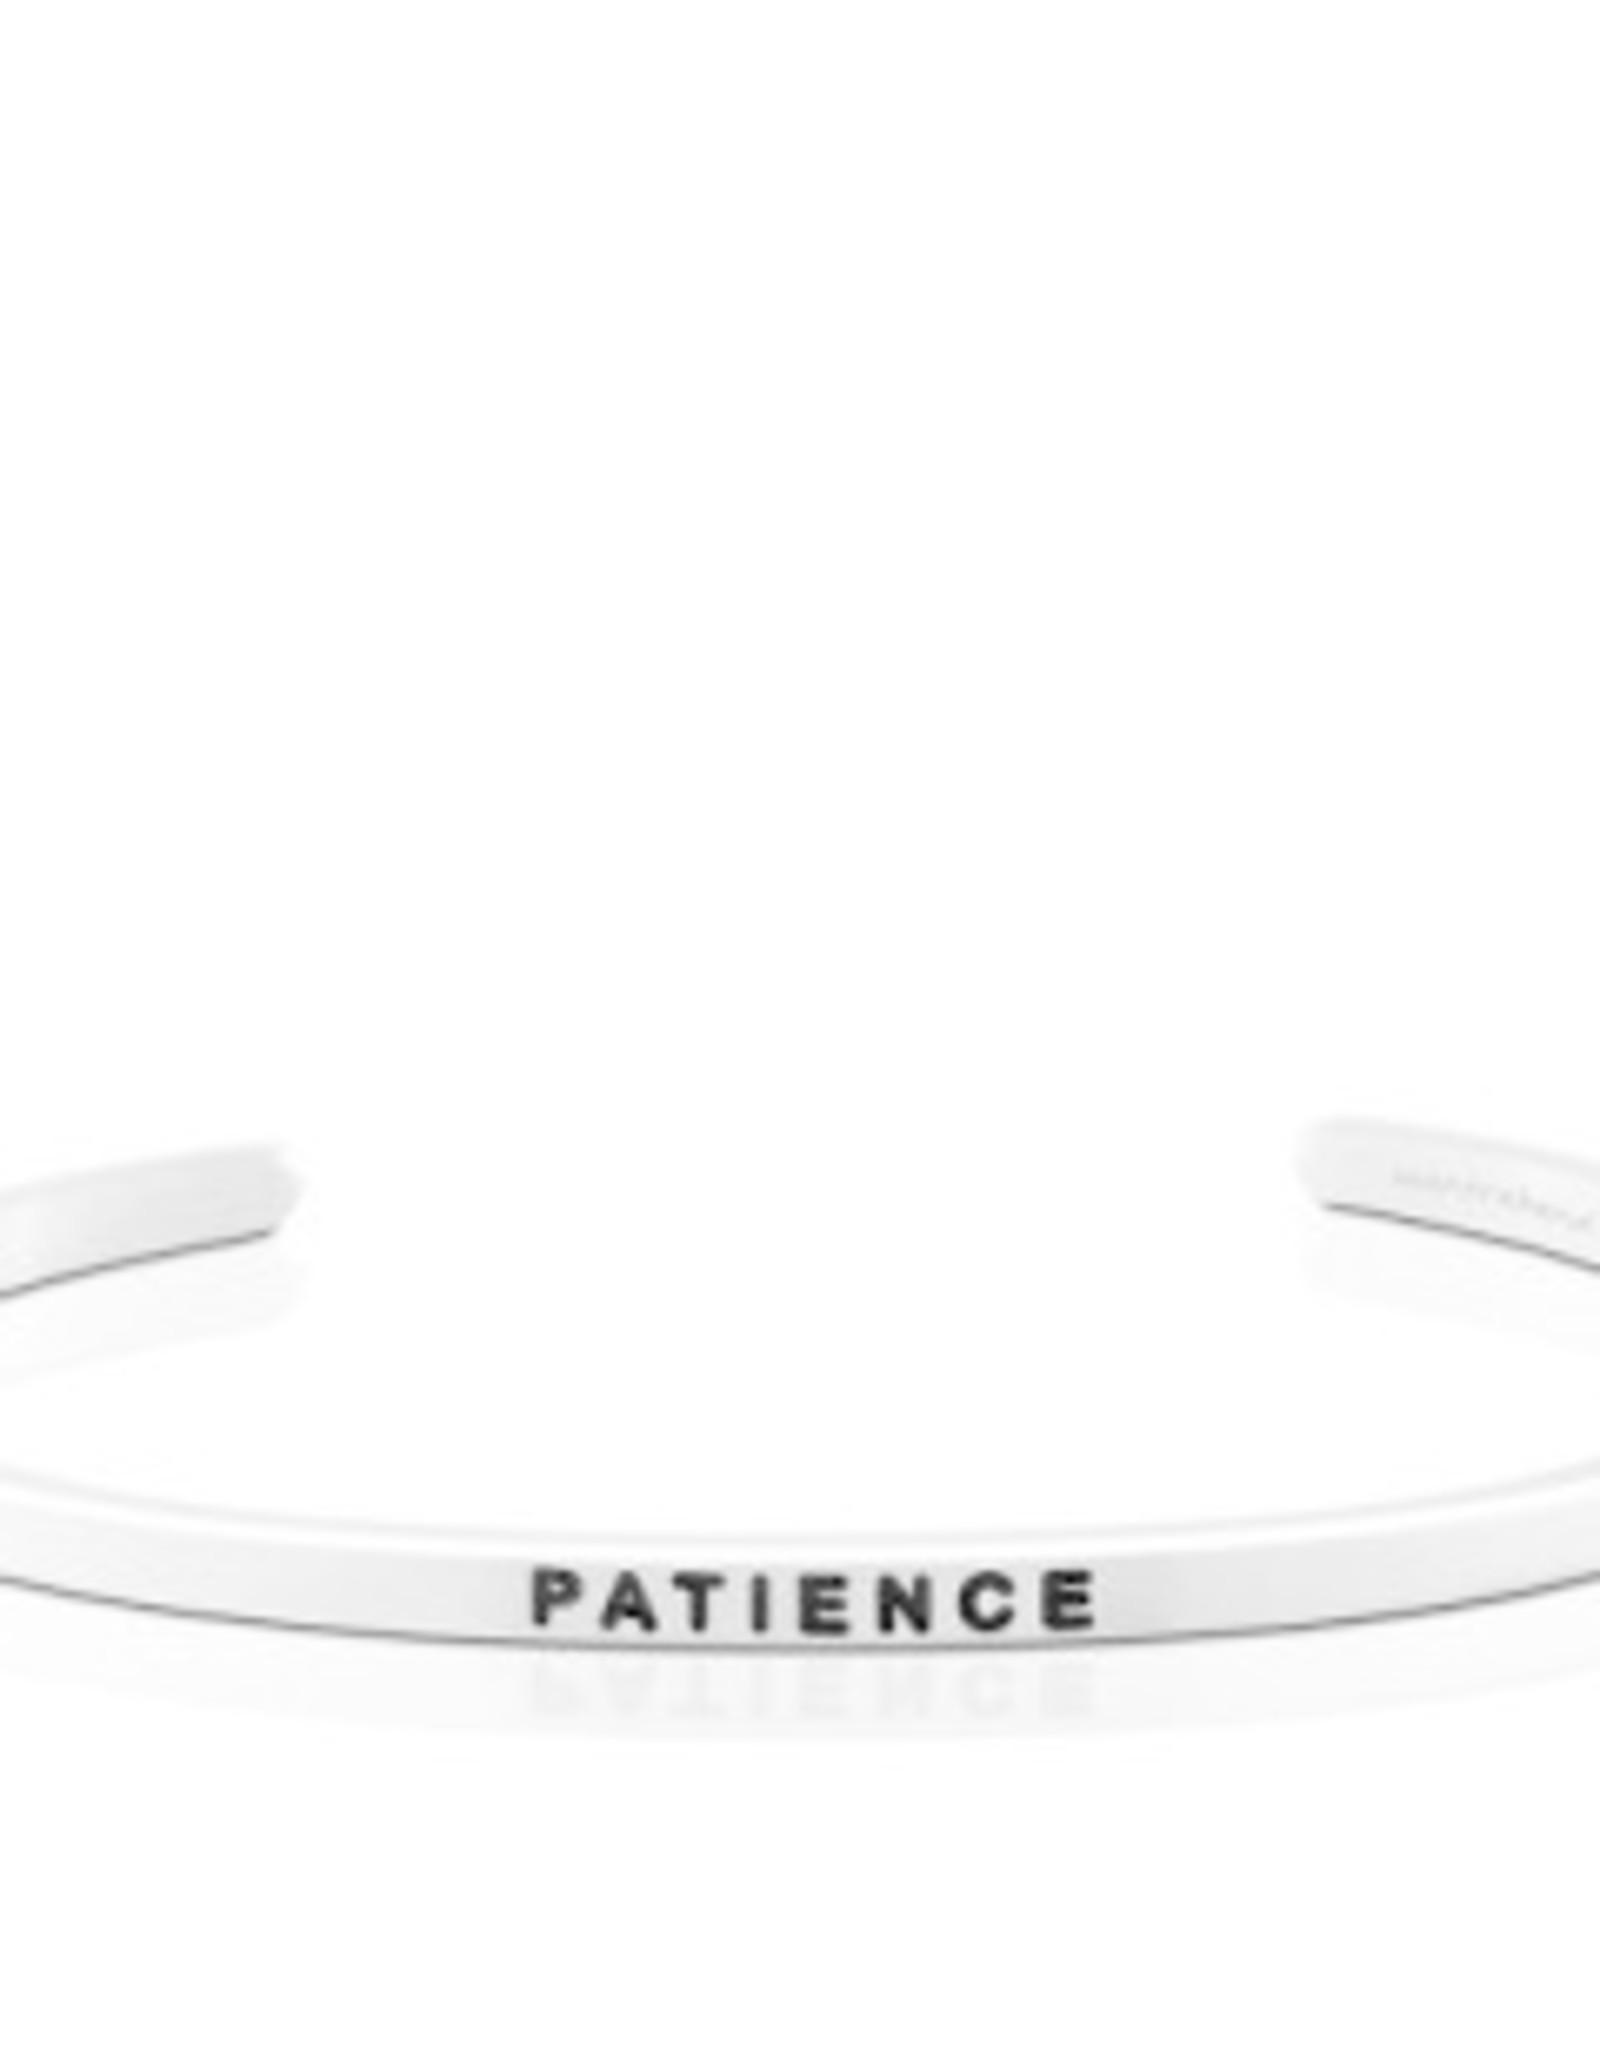 MantraBand MantraBand Bracelet, Patience